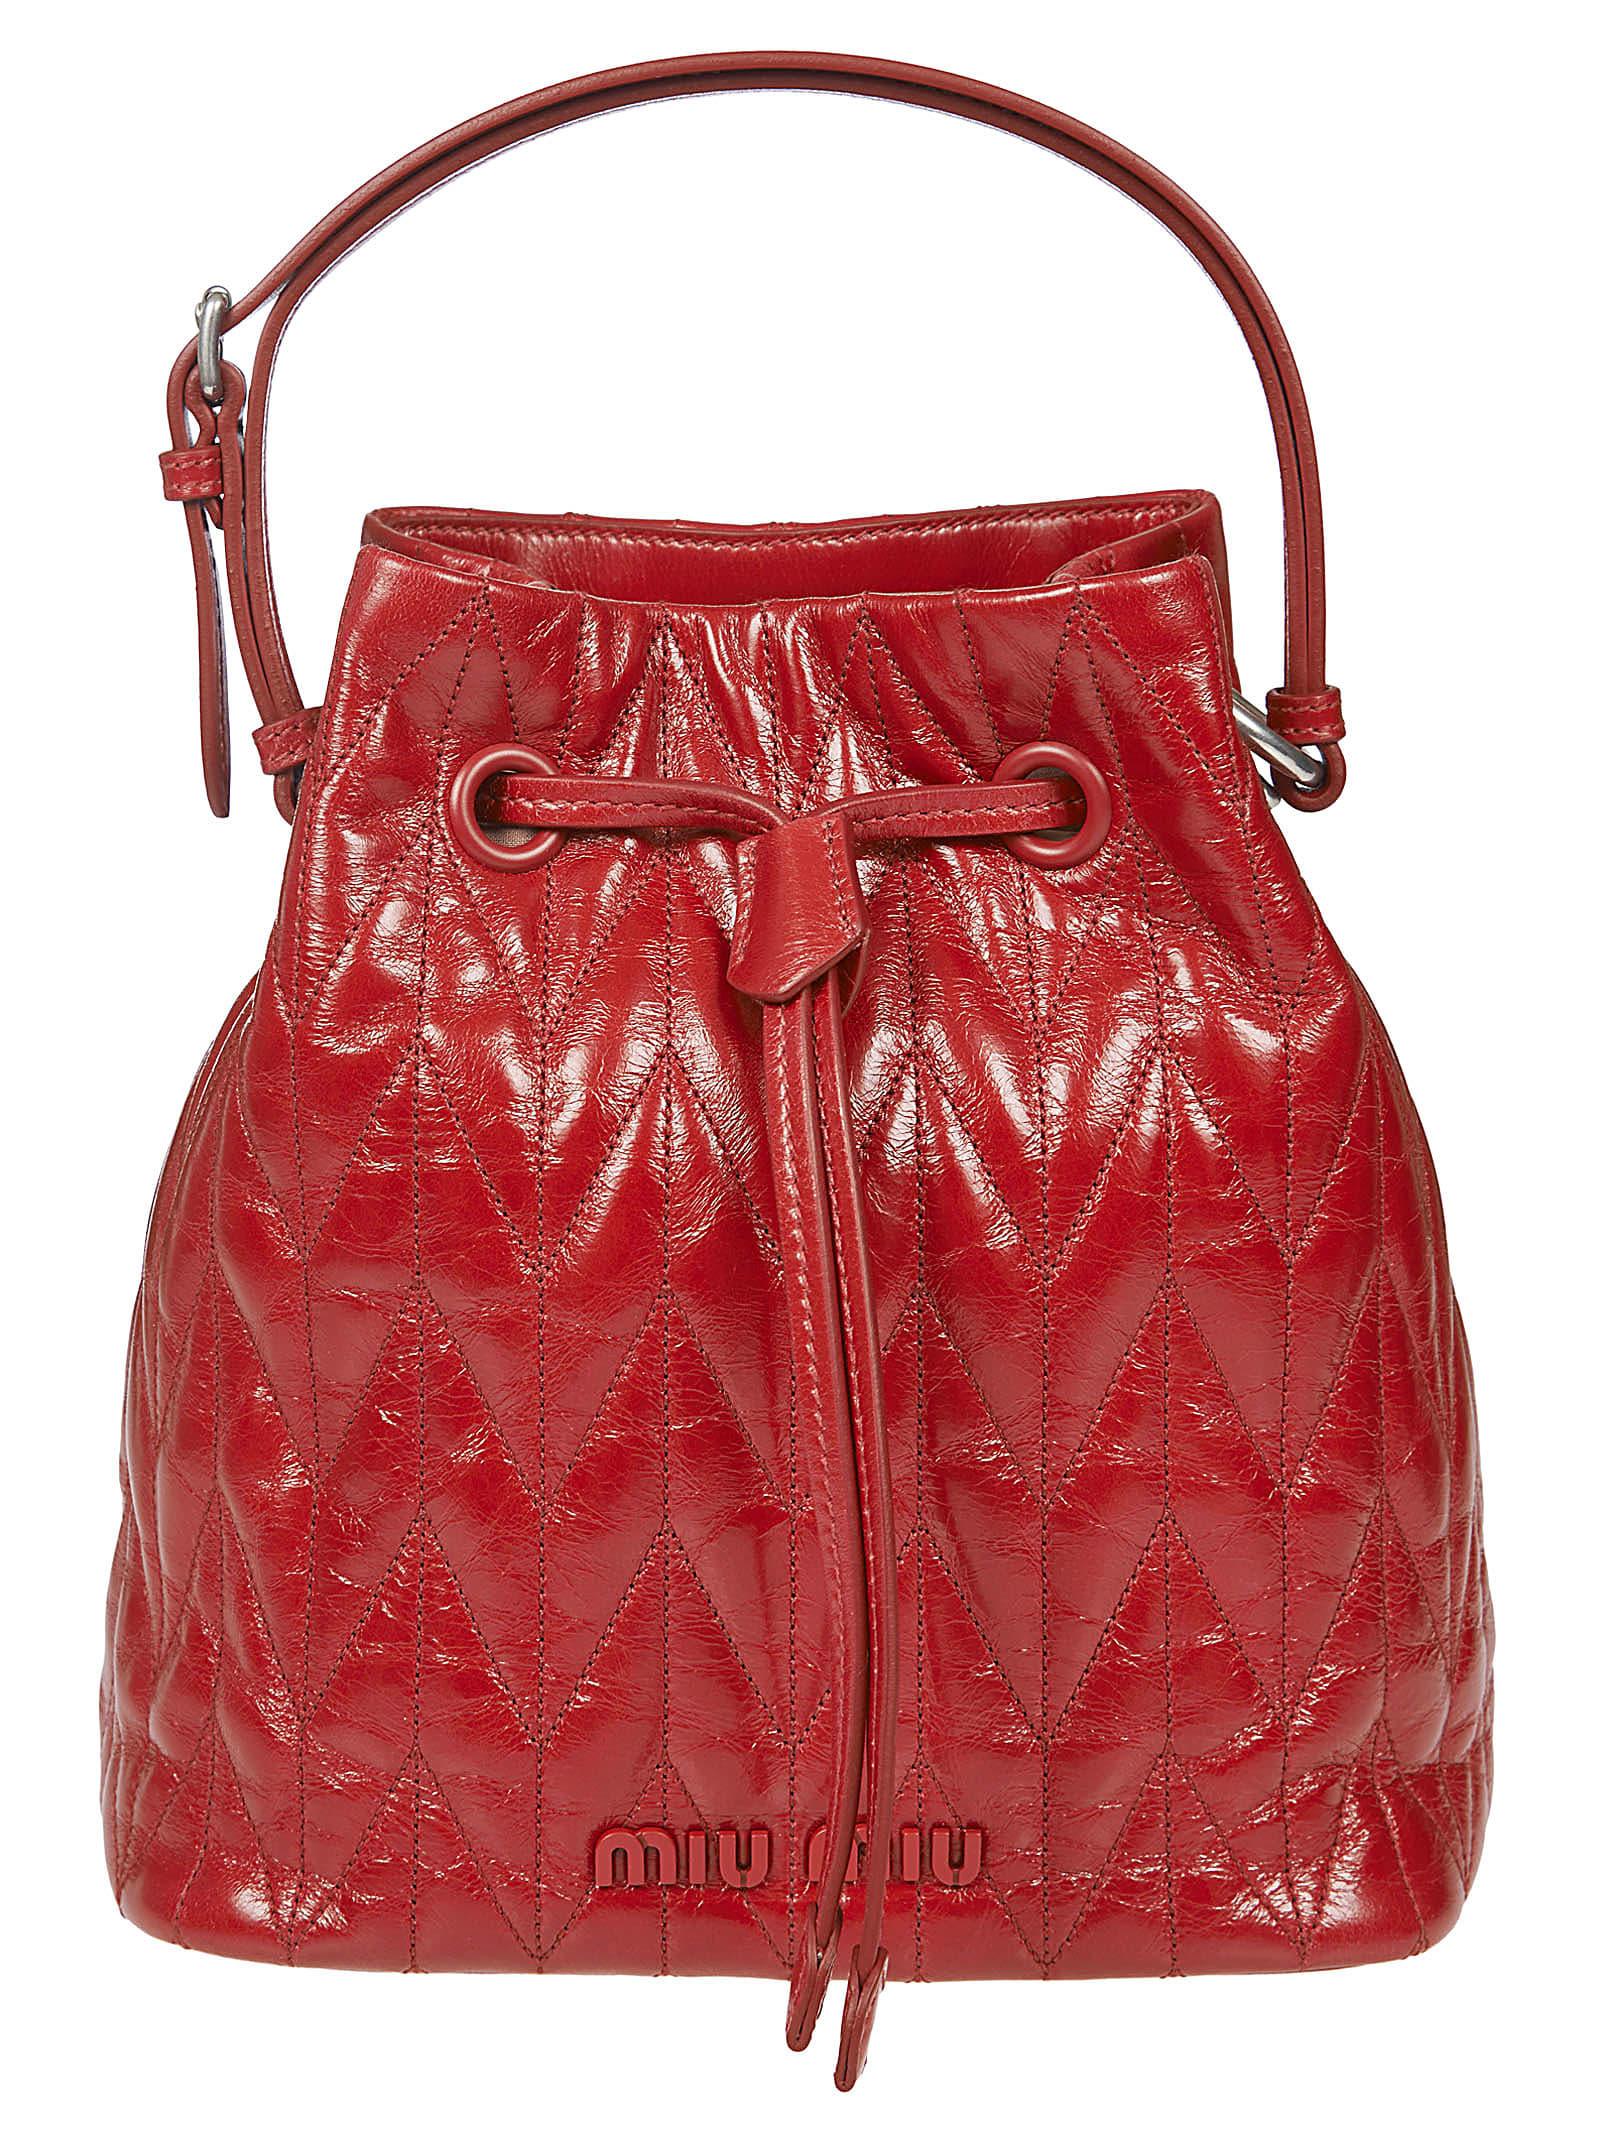 Miu Miu Quilted Bucket Bag